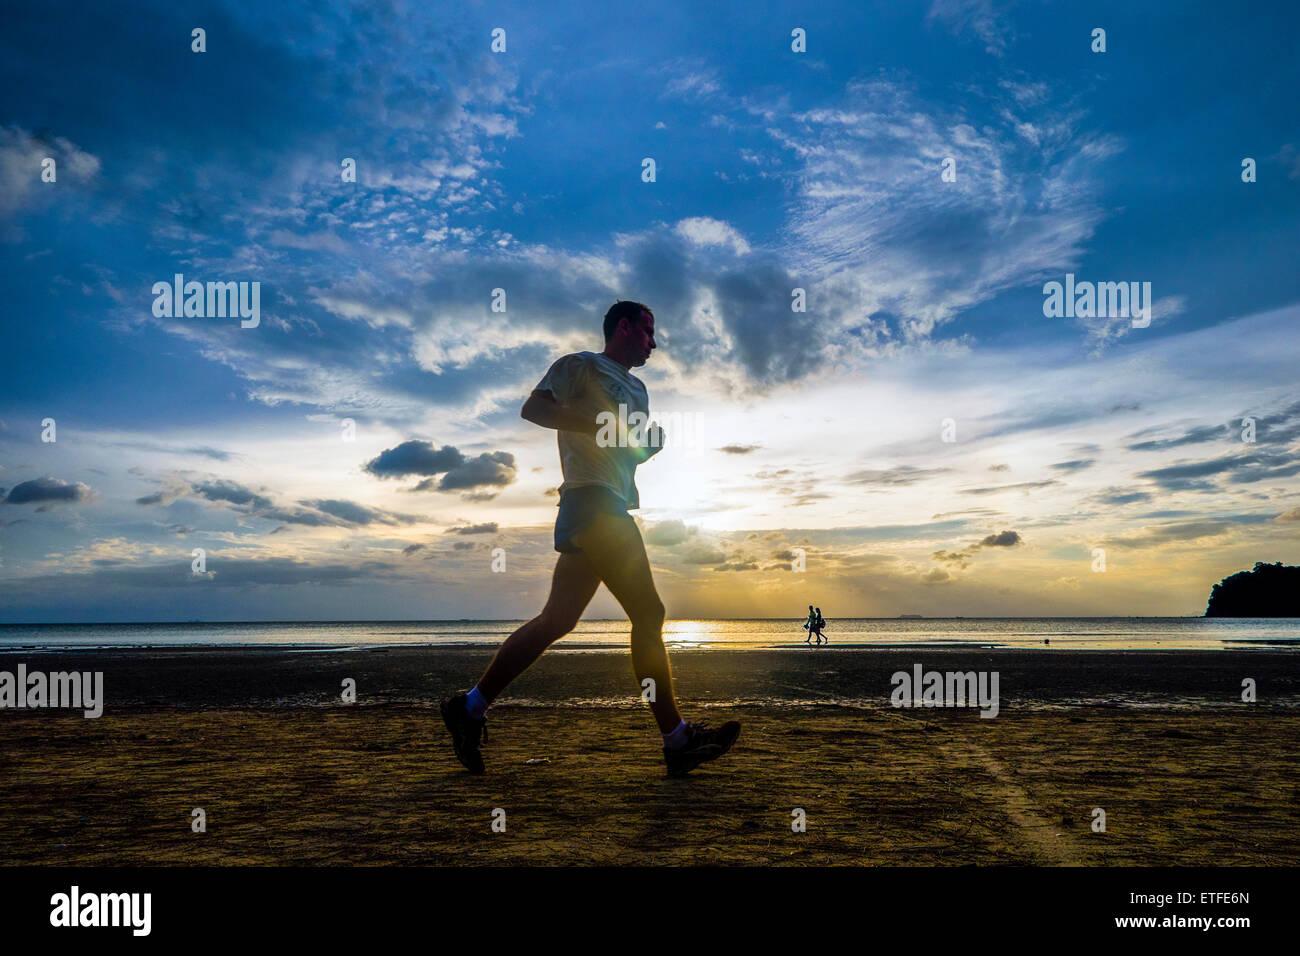 Asia. Thailand. Koh Lanta island. Jogger on the beach at sunset. - Stock Image